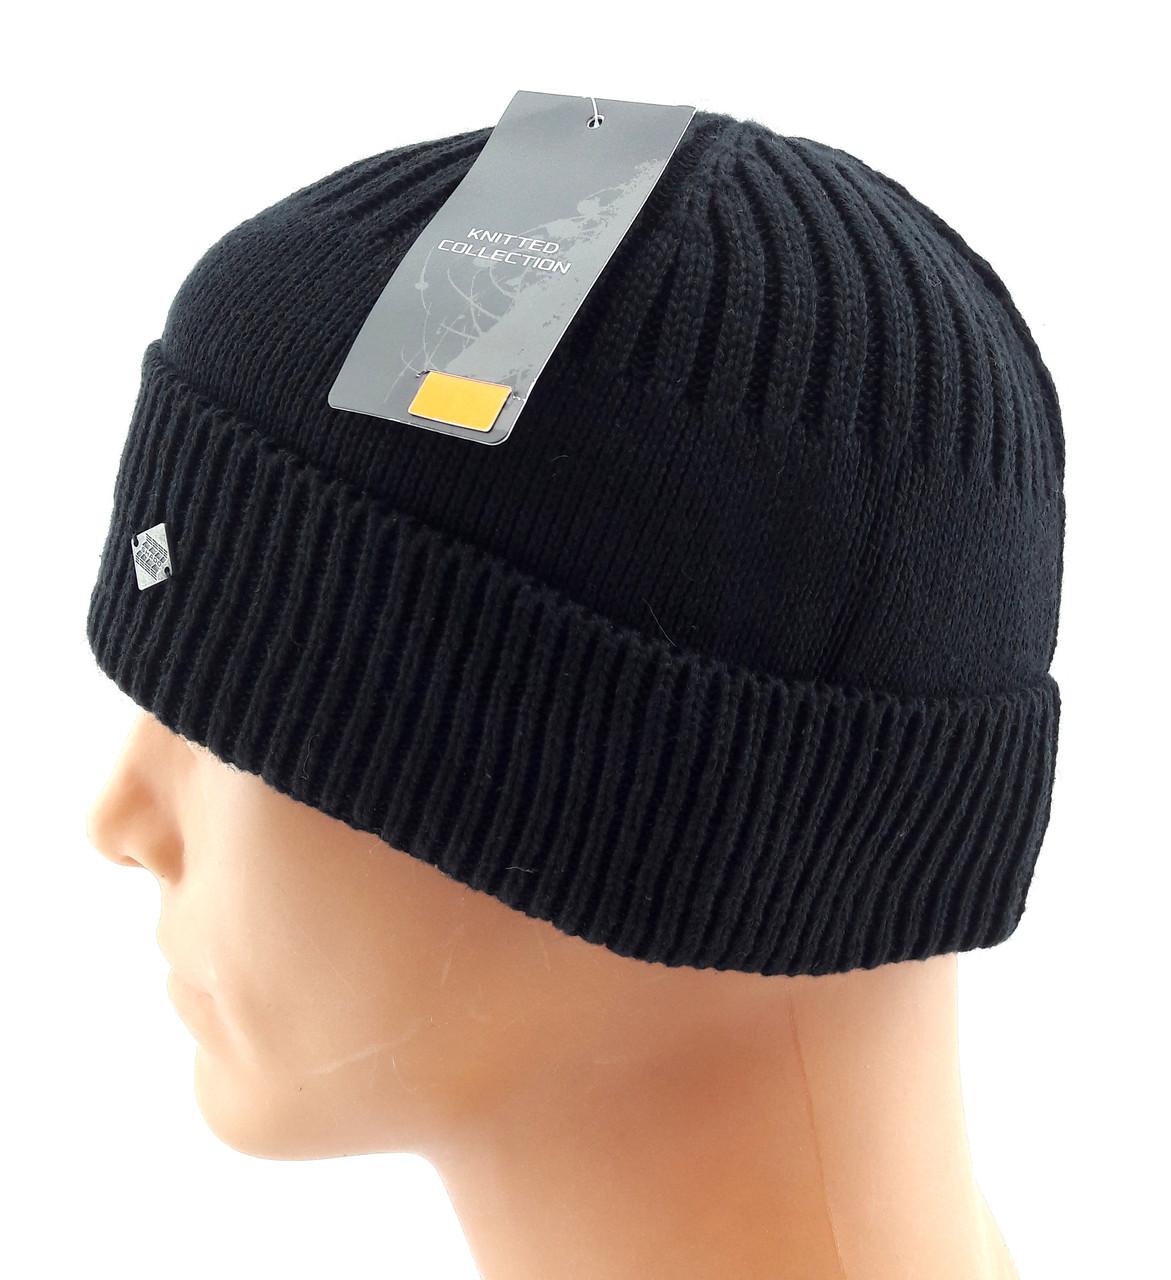 вязаная шапка мужская с заворотом Shado 57 62 размер глубокая шб68